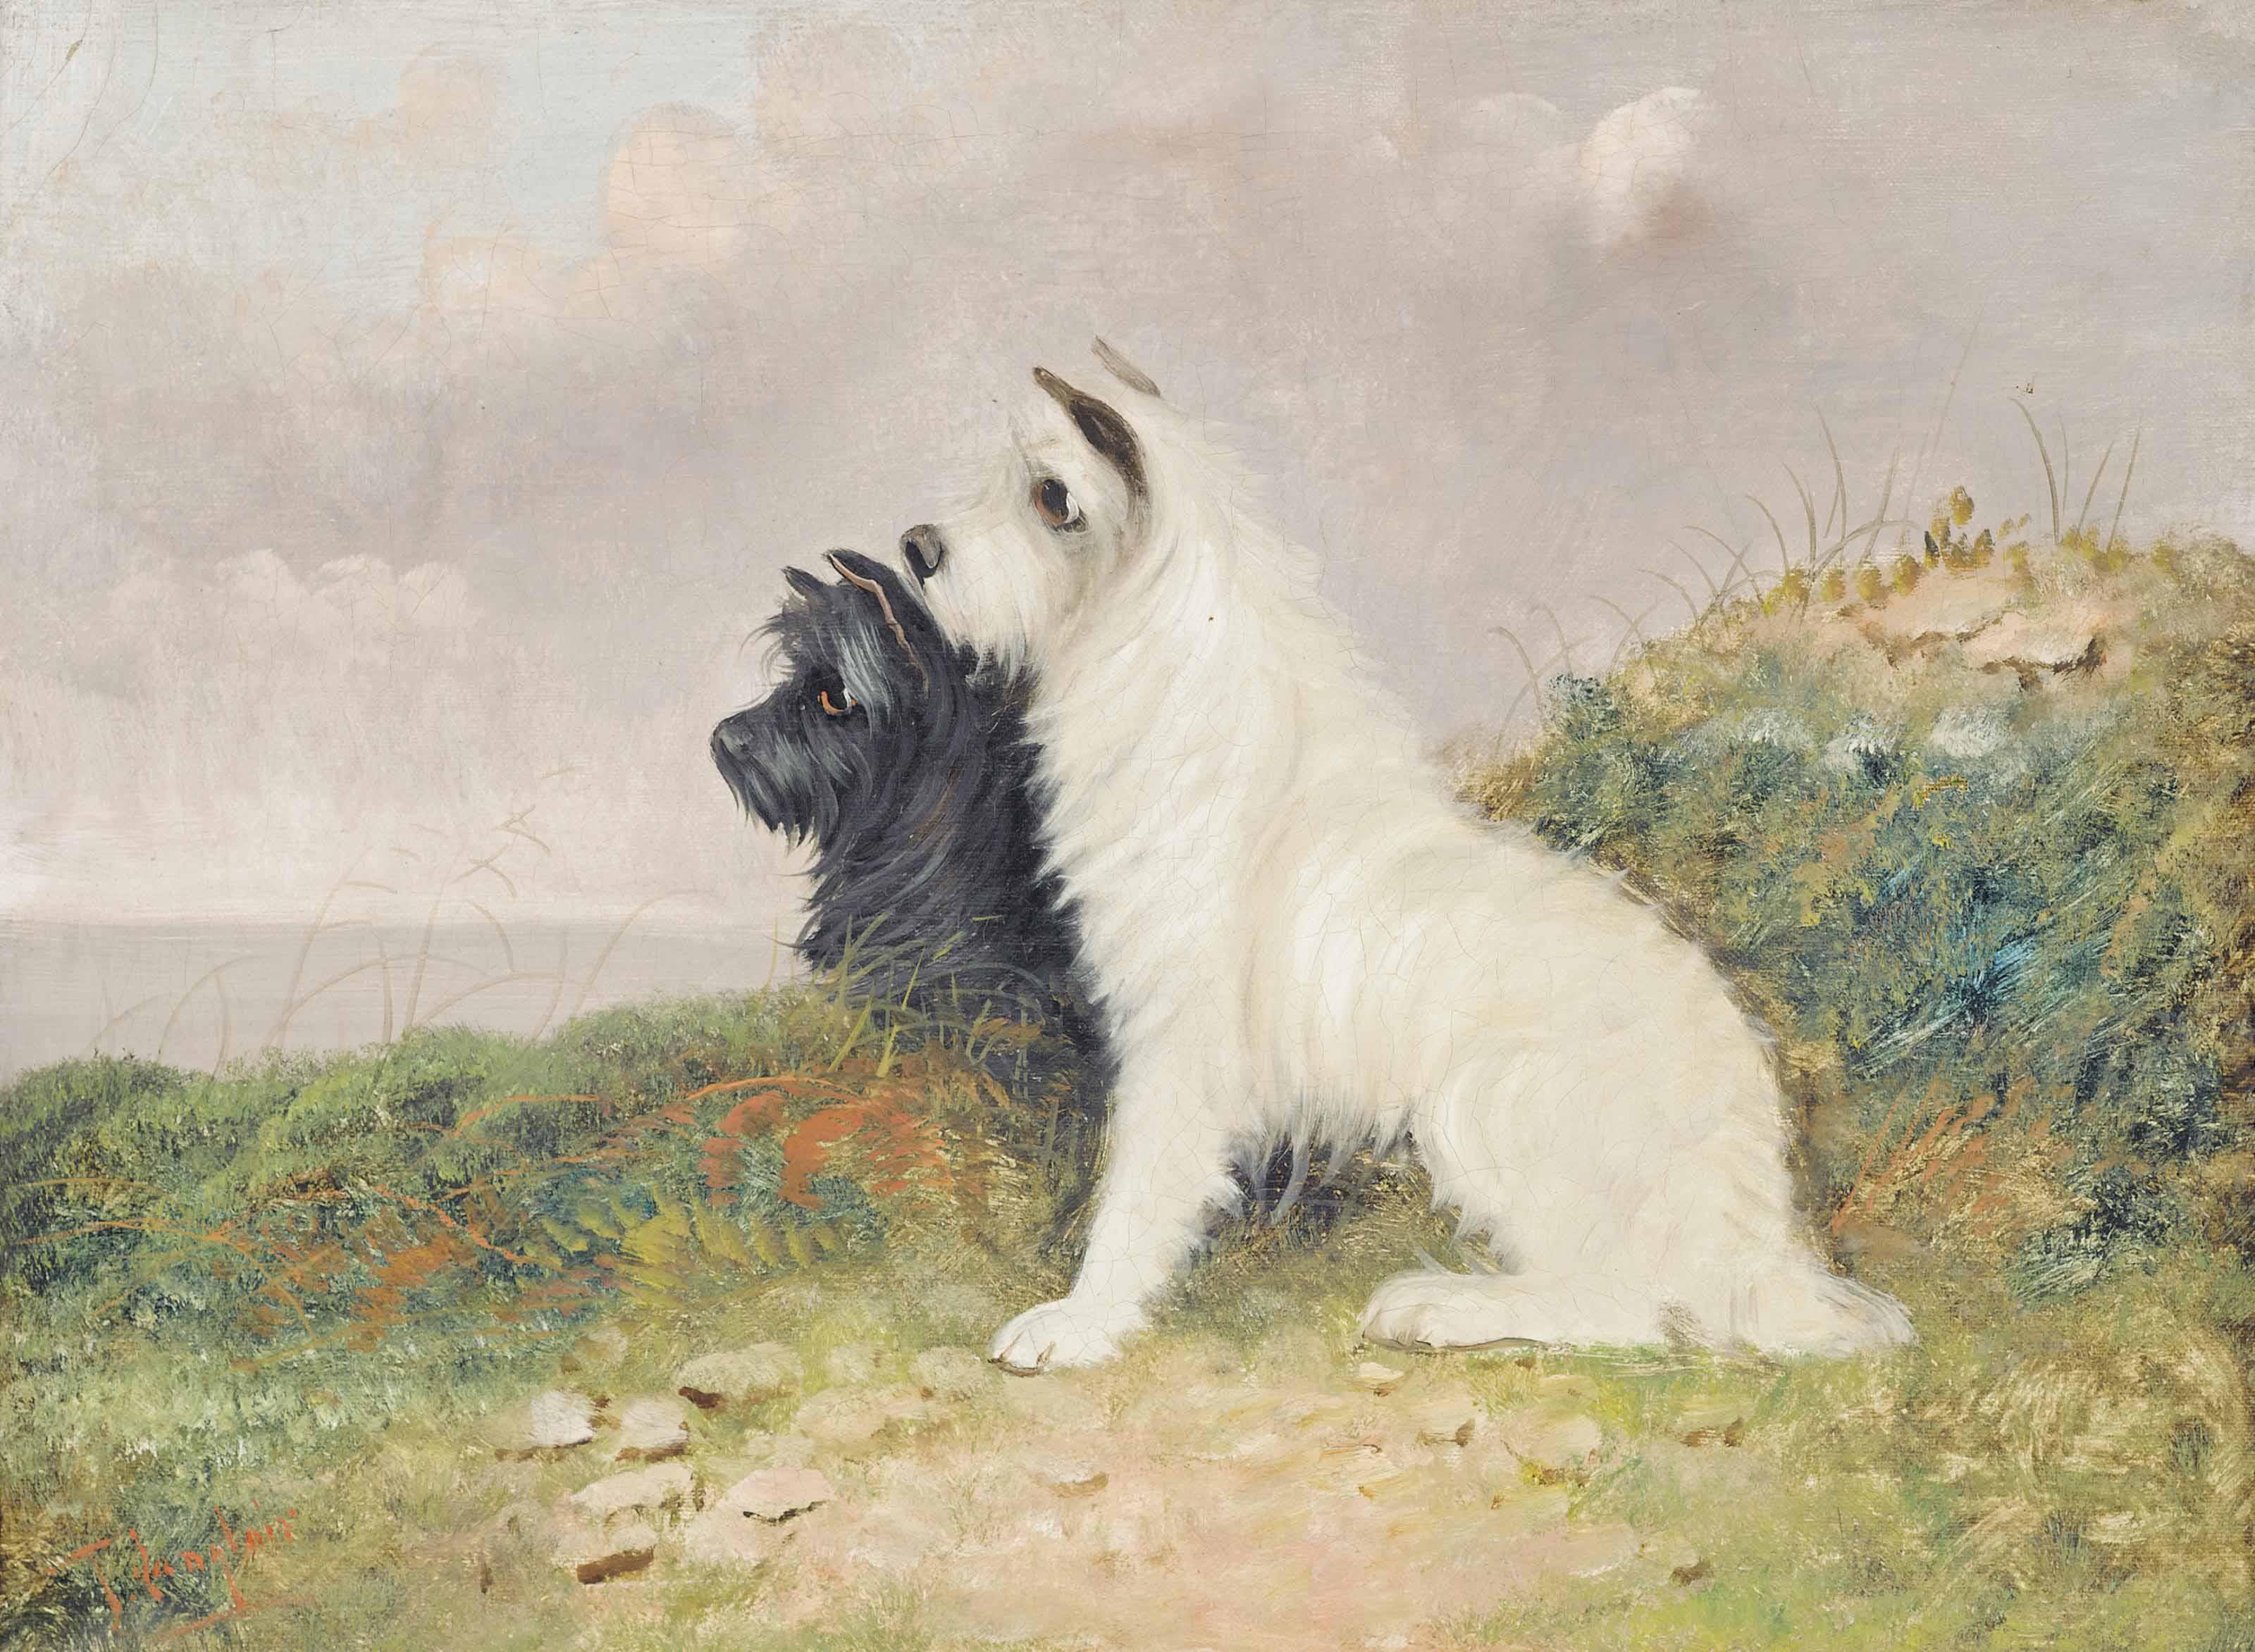 J. Langlois, 19th Century